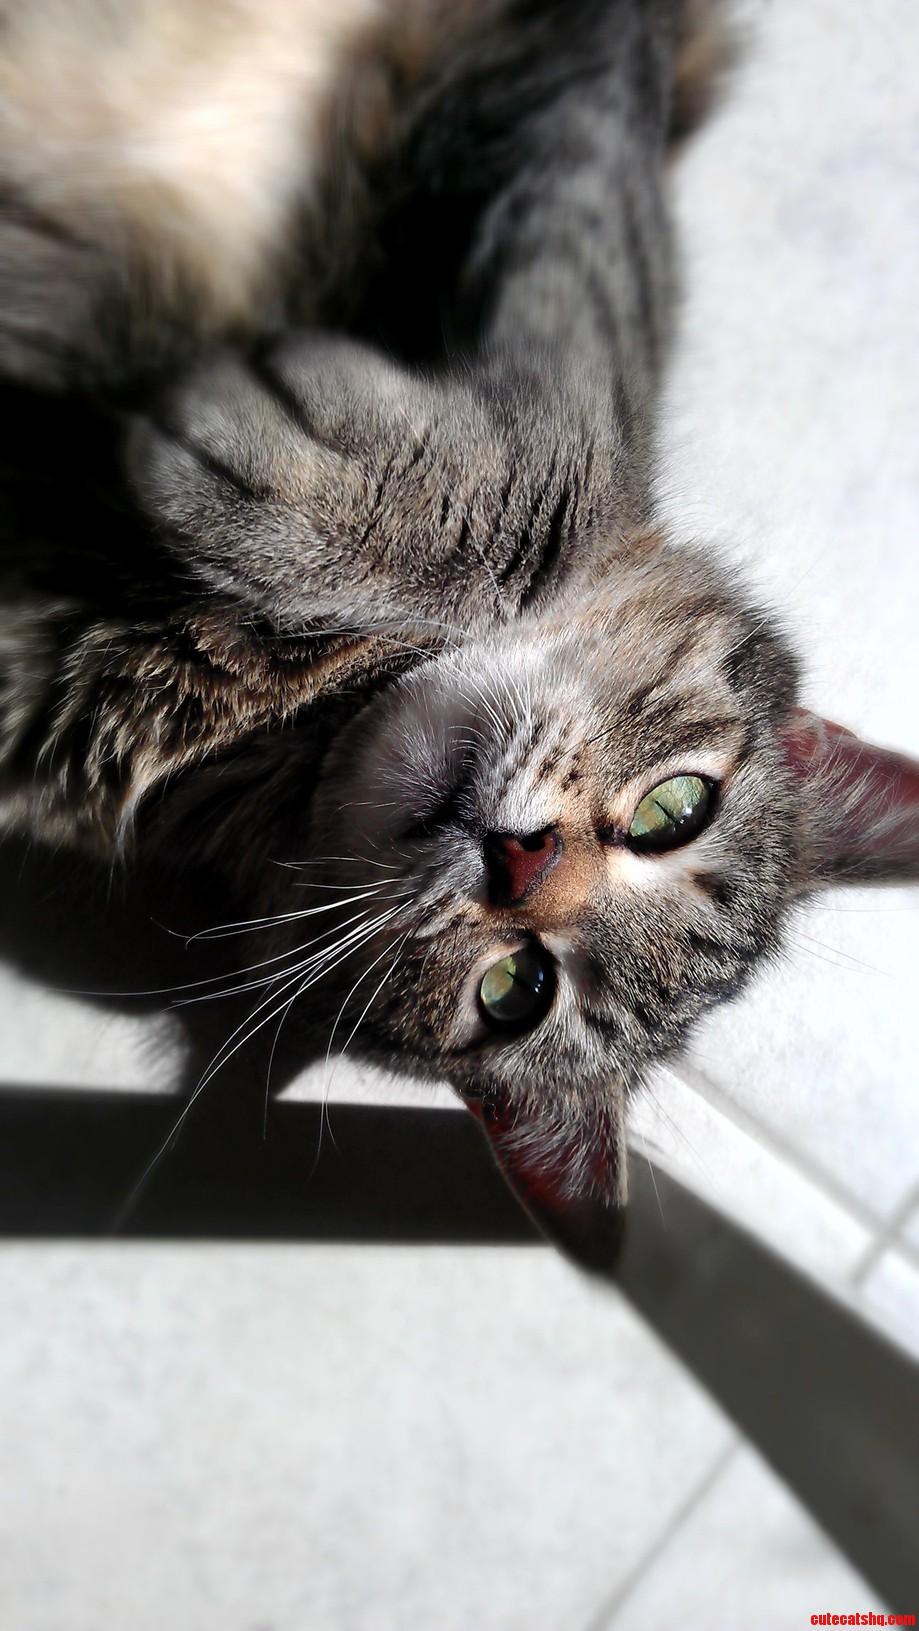 My Totally Plain Pretty Tabby Cat